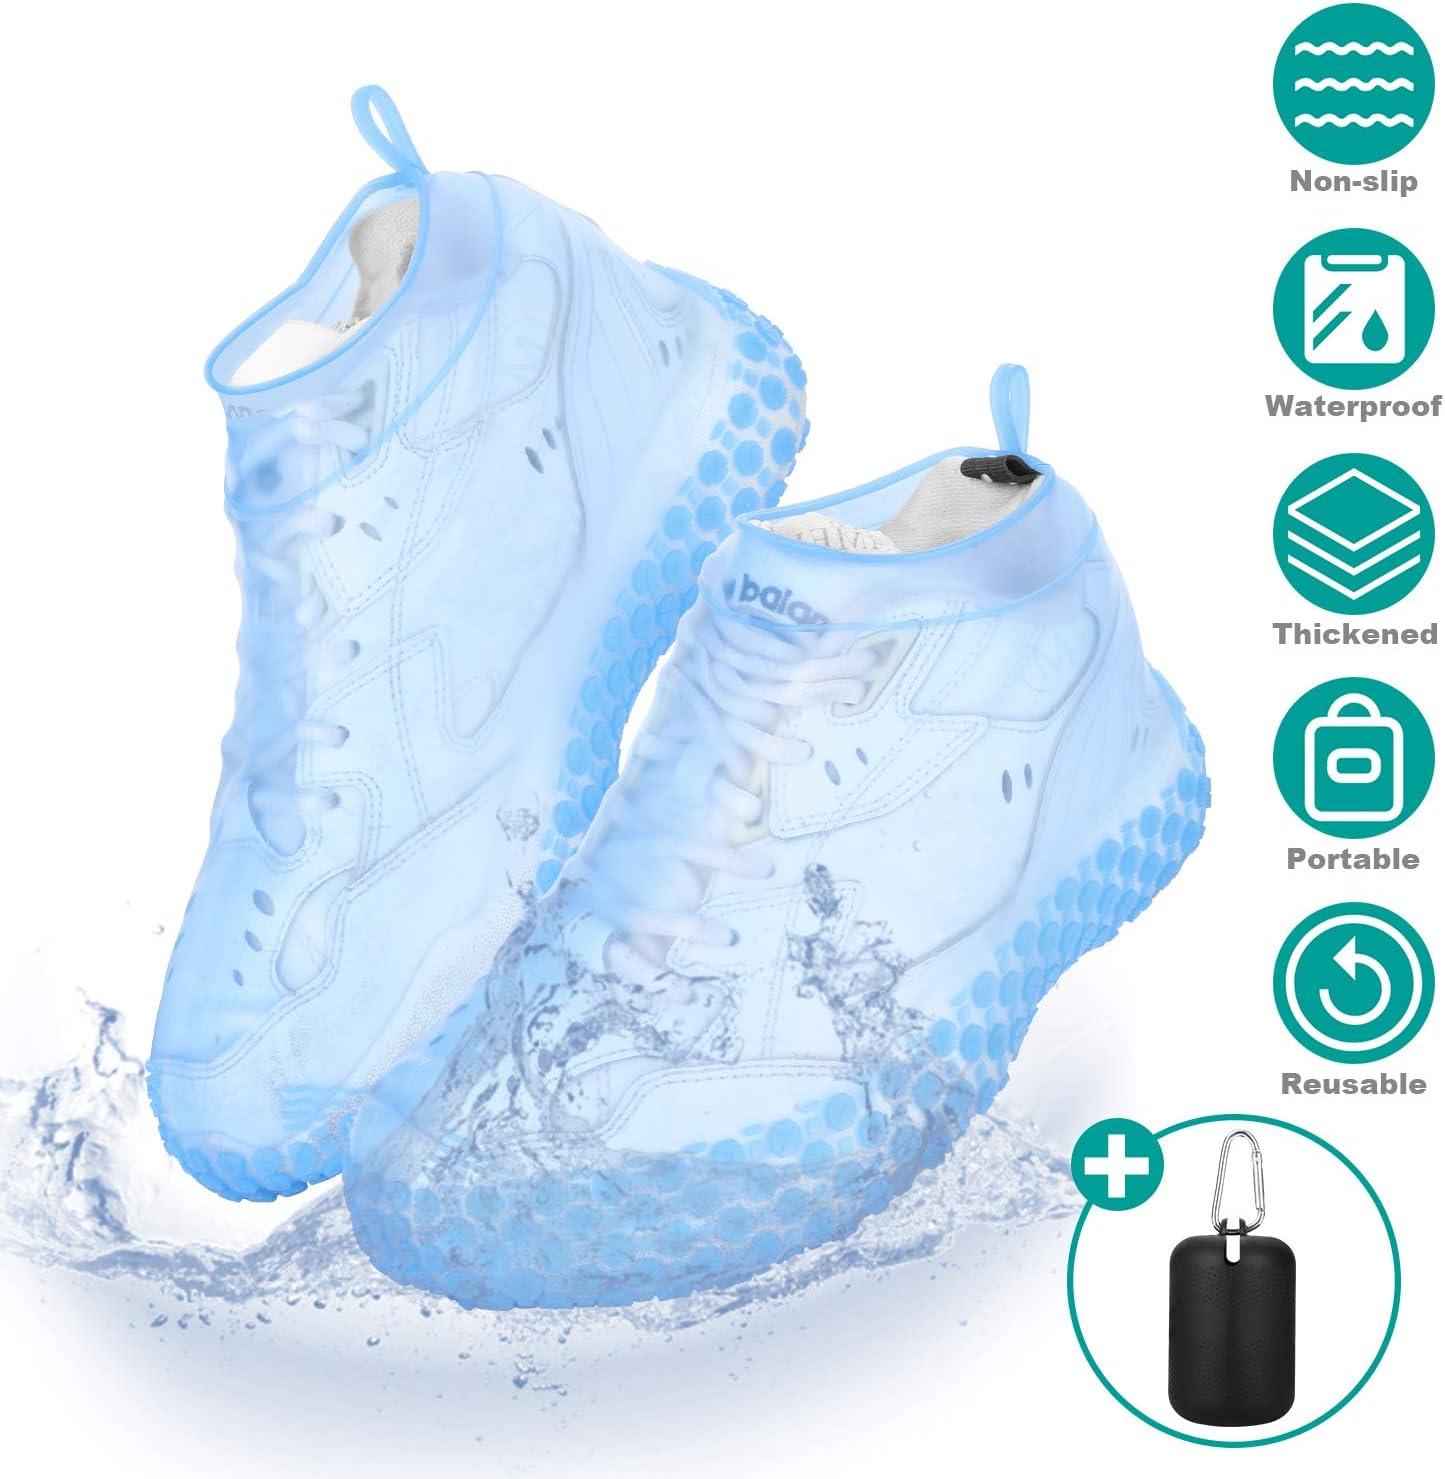 JNUYISW Waterproof Shoe Covers,Reusable Non Slip Silicone Shoe Covers,Rain Snow Overshoe Foldable Galoshes for Men,Women,Kids